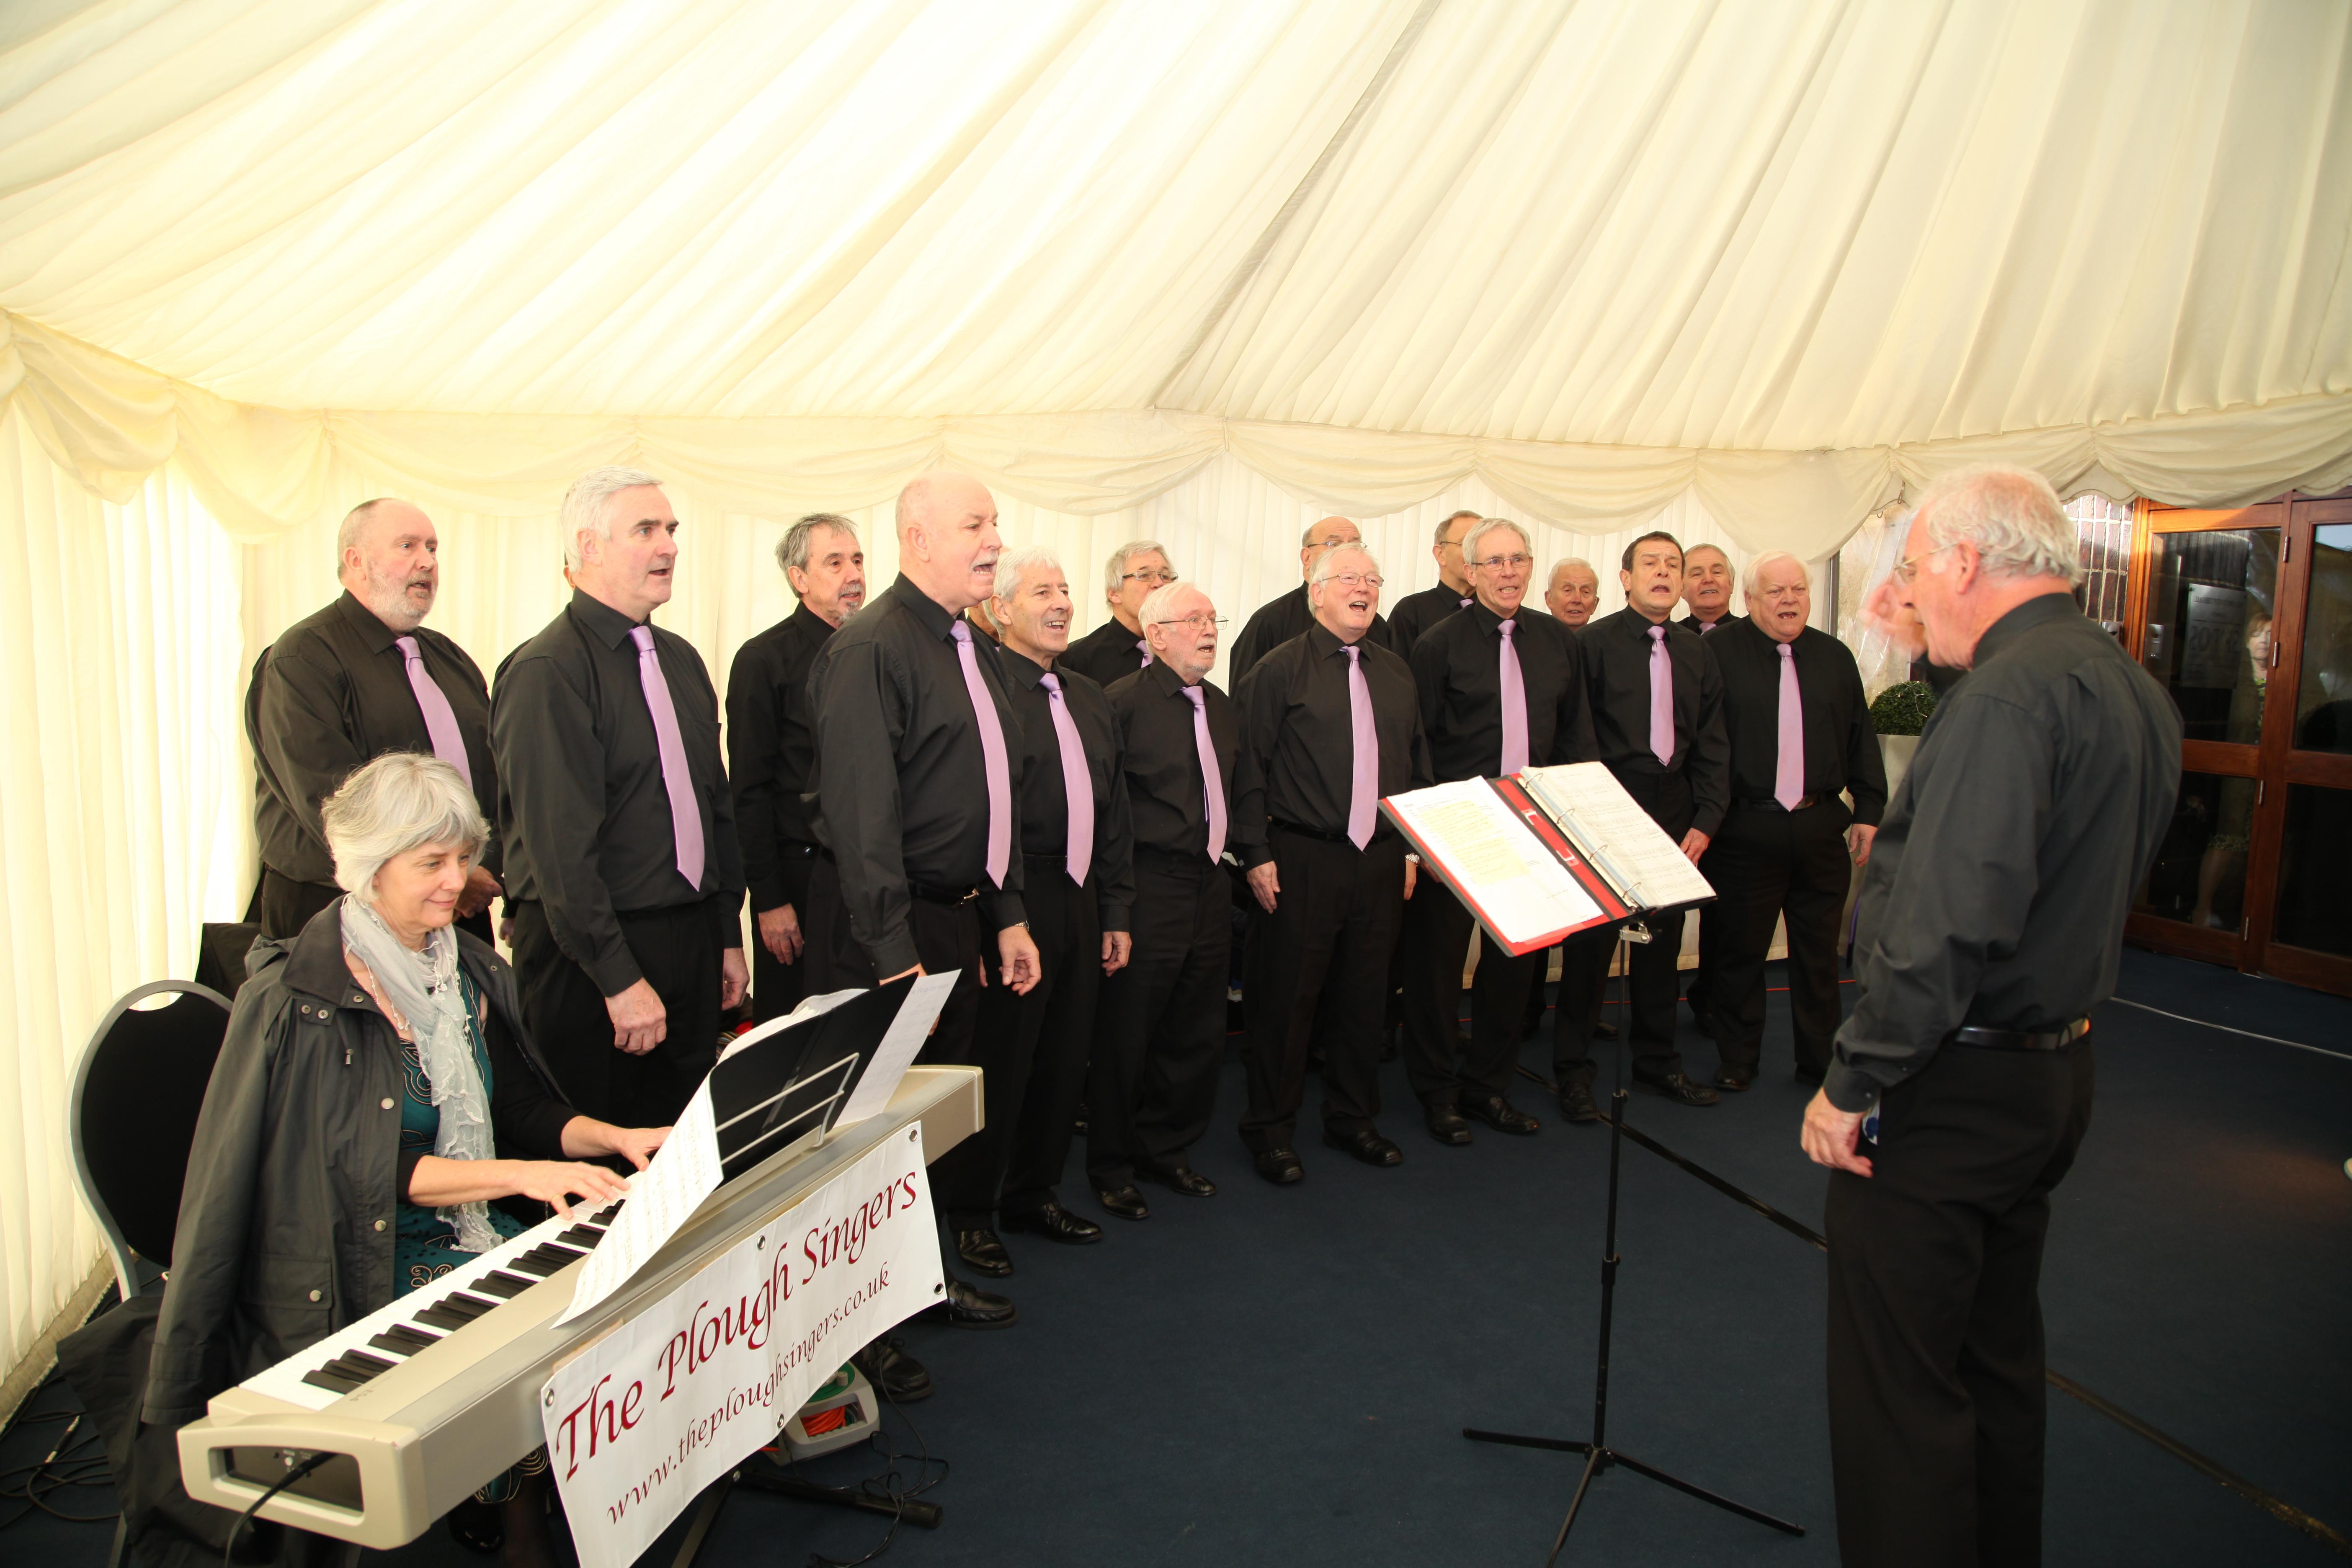 Plough Singers